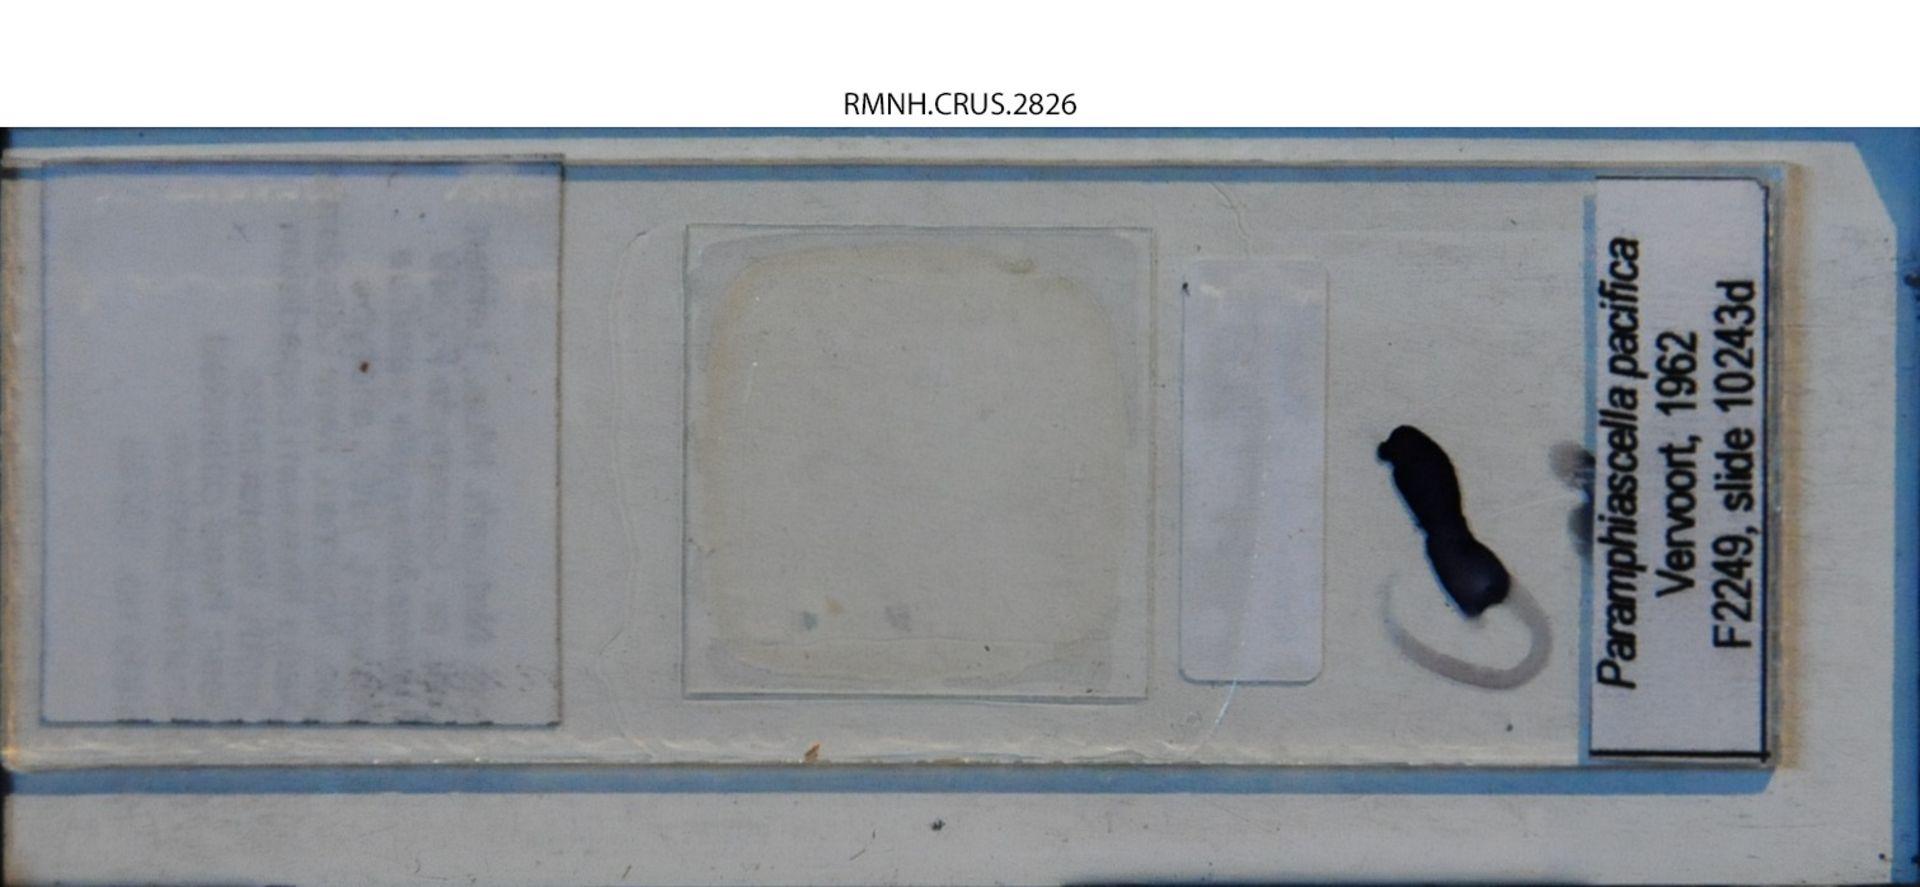 RMNH.CRUS.2826   Paramphiascella pacifica Vervoort, 1962